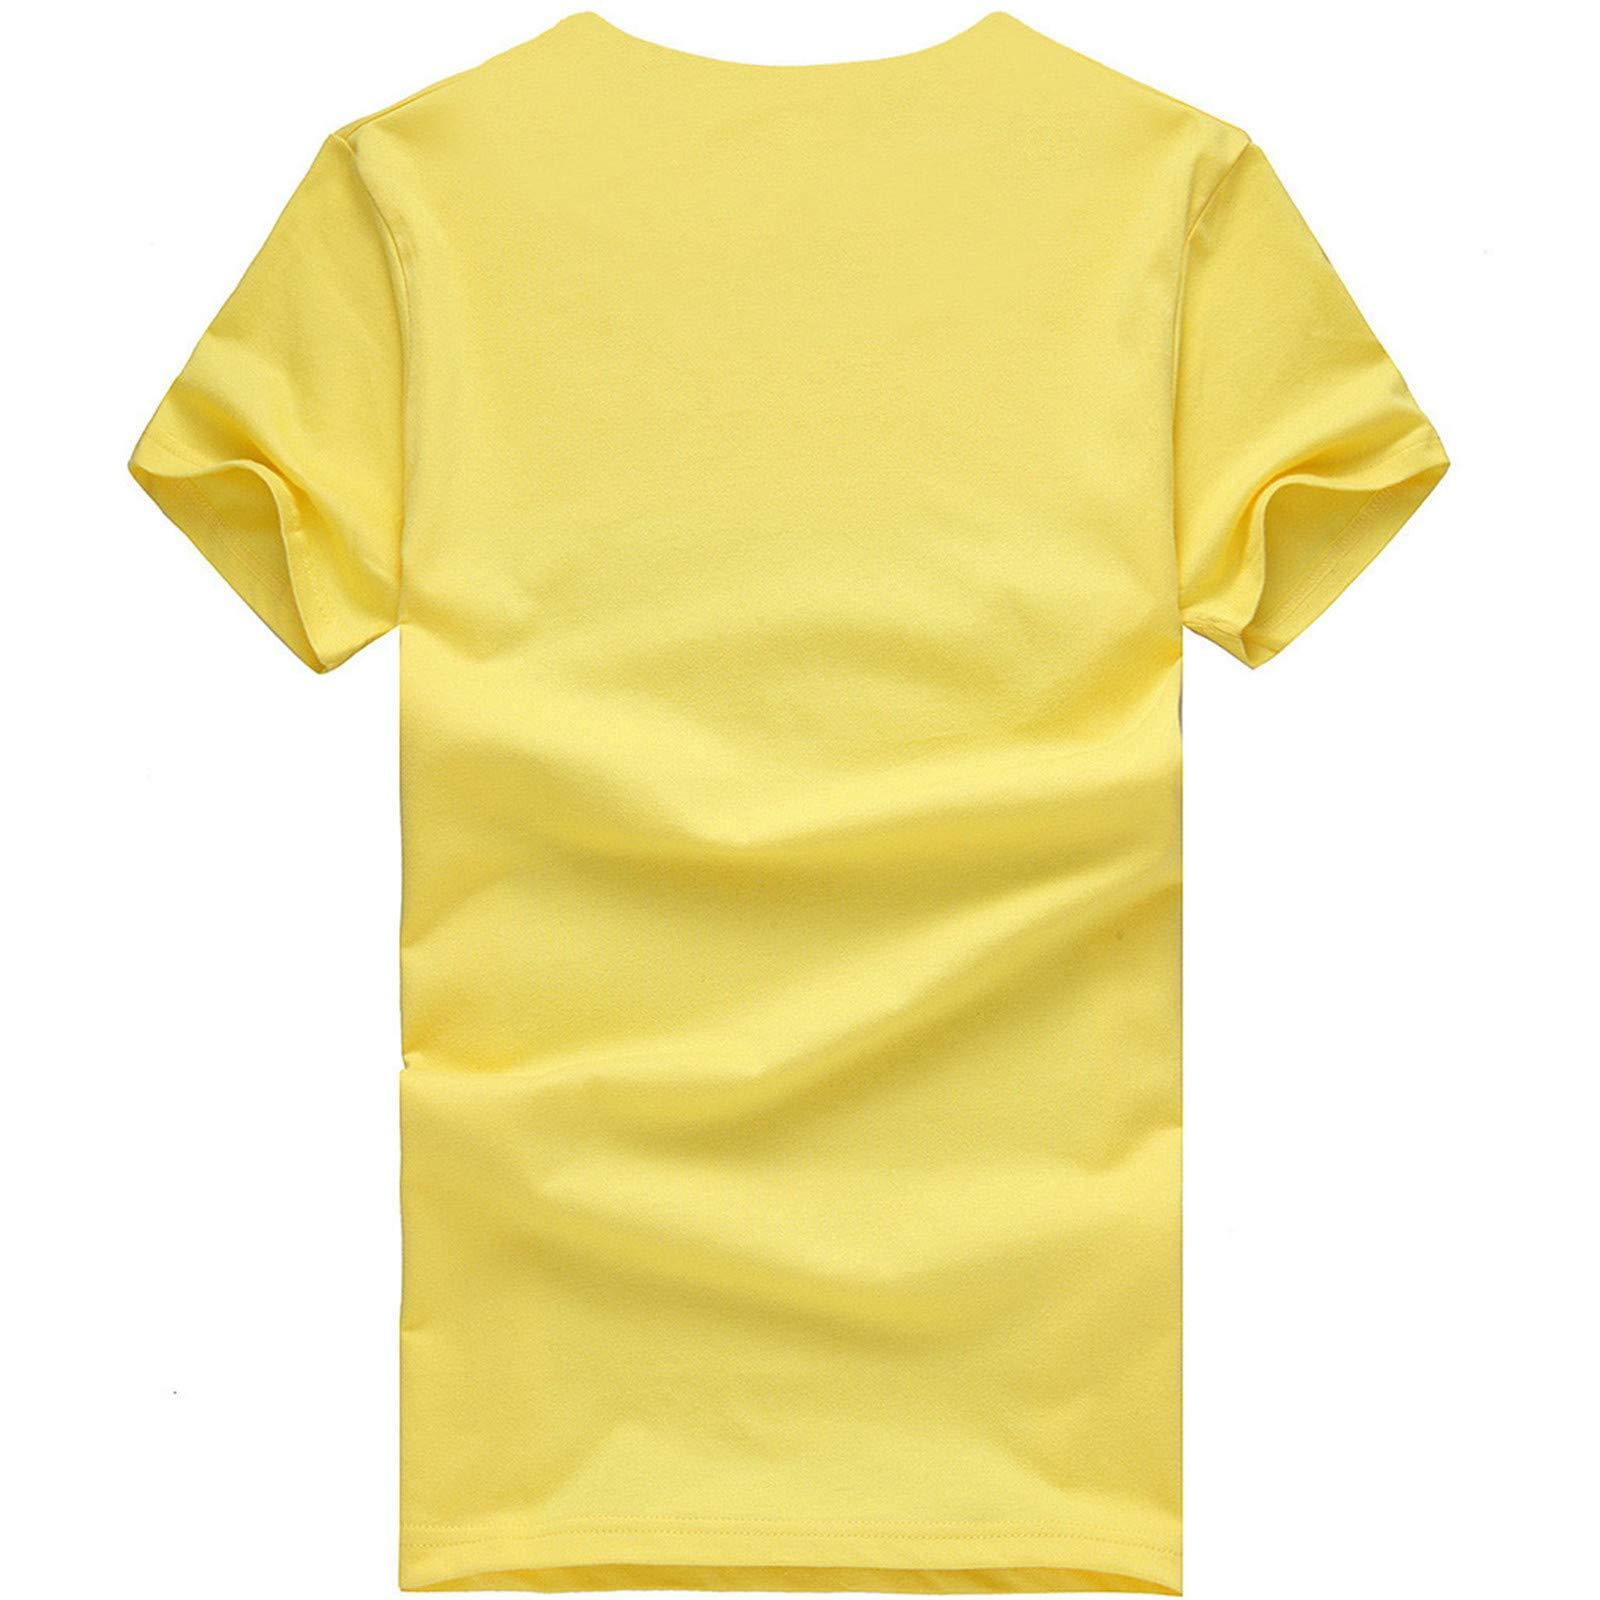 wodceeke Womens Cute Cat Printed Casual Short Sleeve Cotton O-Neck Tees Shirt(Yellow,XL) by wodceeke (Image #4)